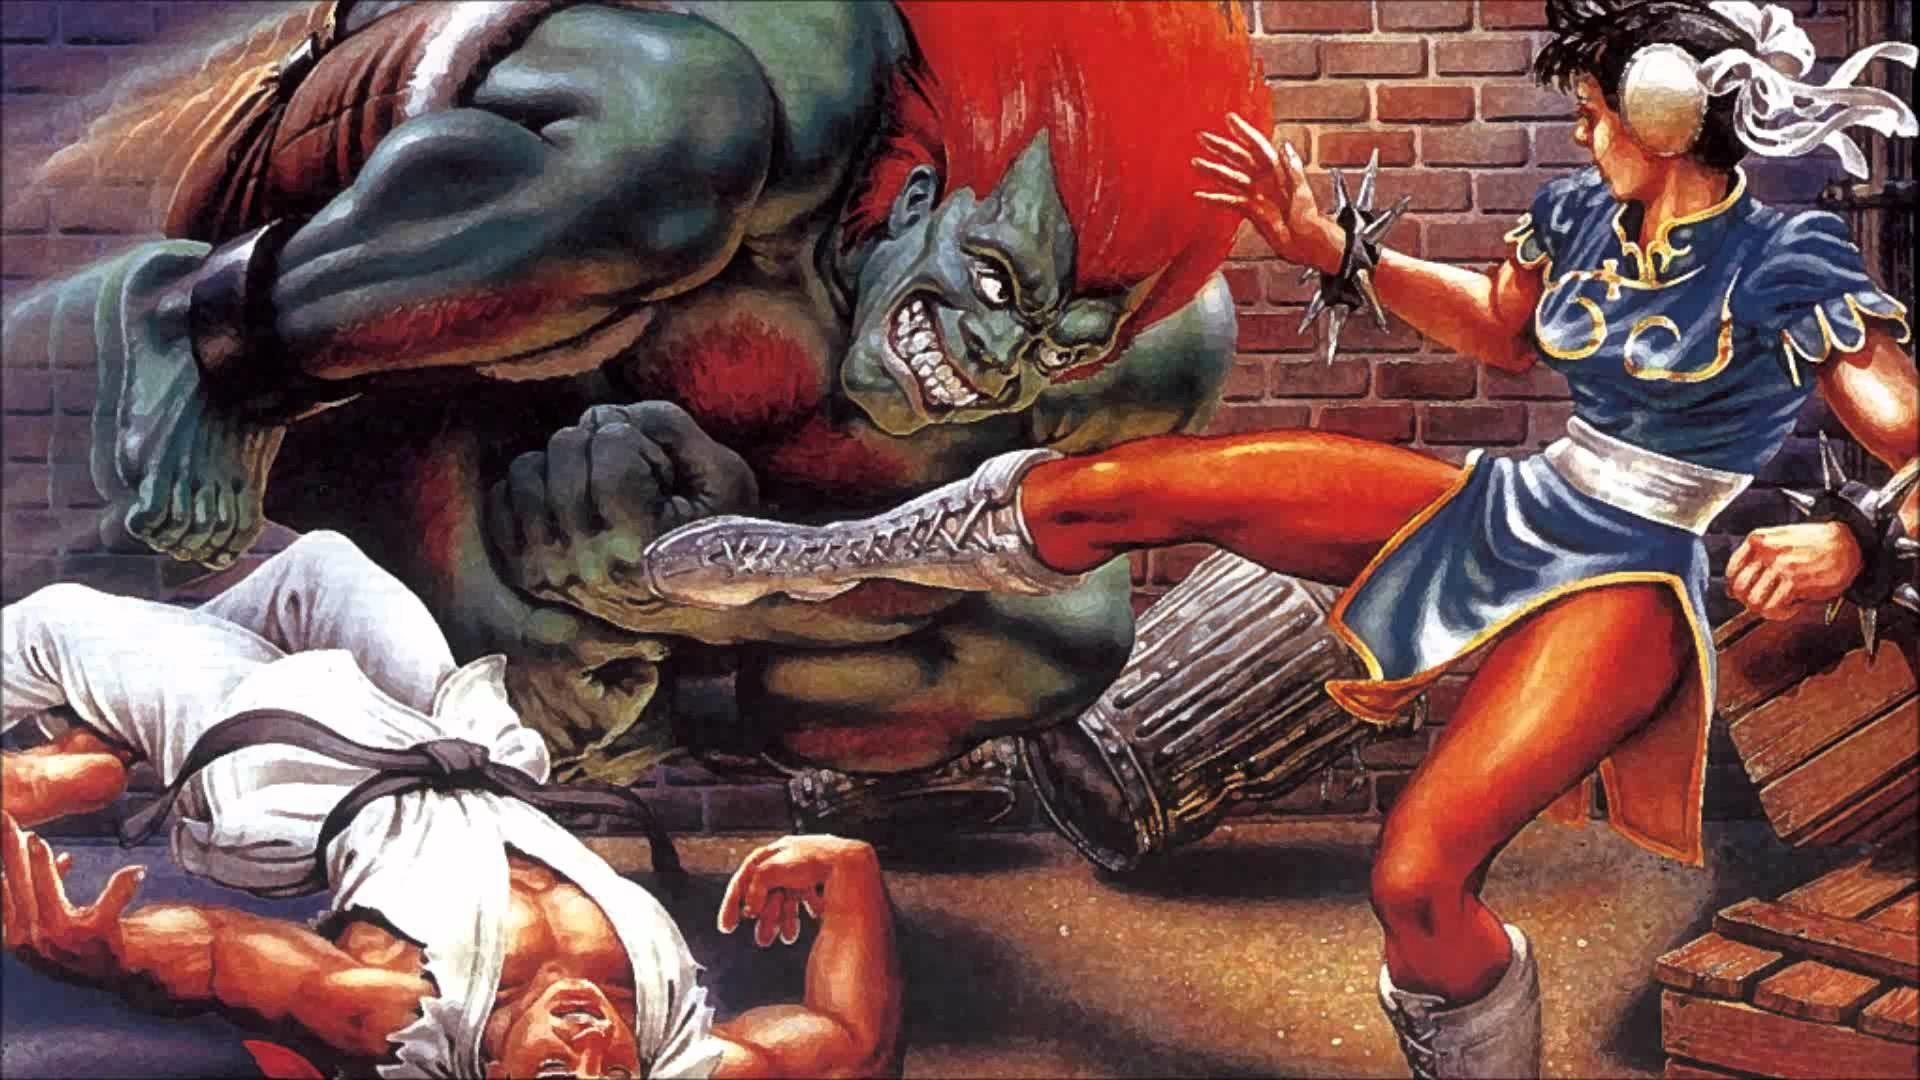 Street Fighter 2 Wallpaper 72 Images